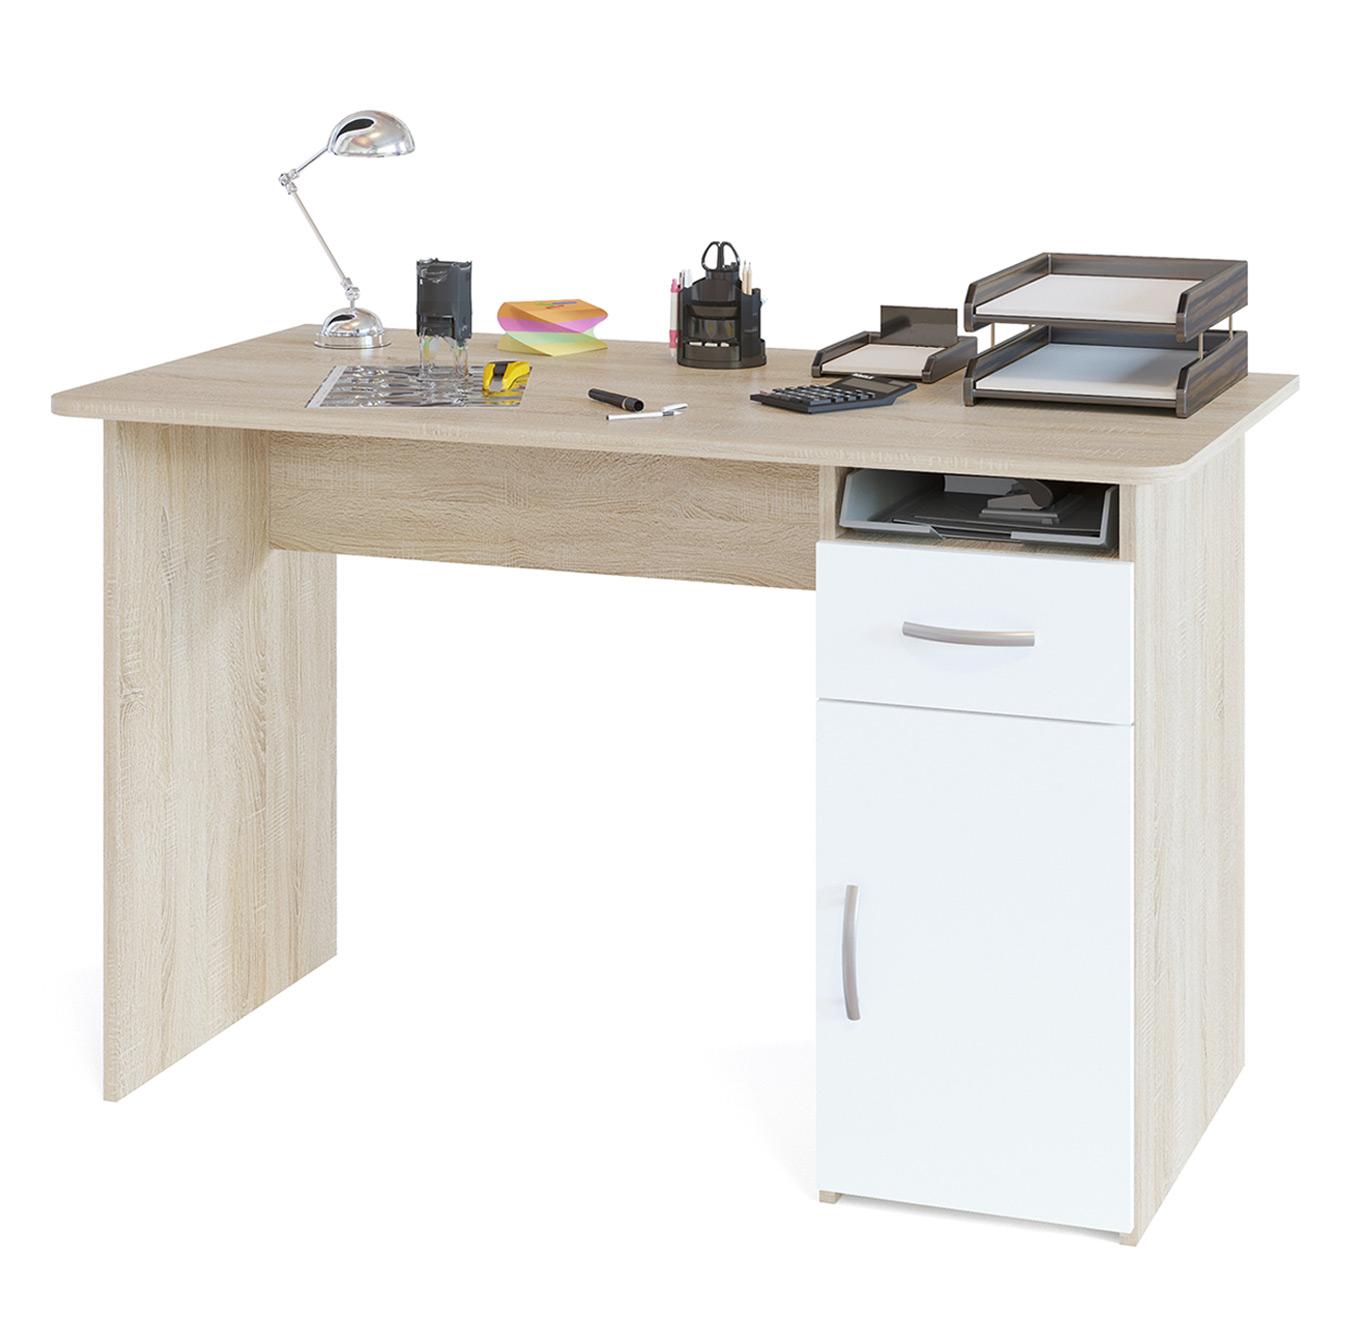 Письменный стол Сокол СПМ-03.1 дуб сонома/белый, 120х60х74 см.